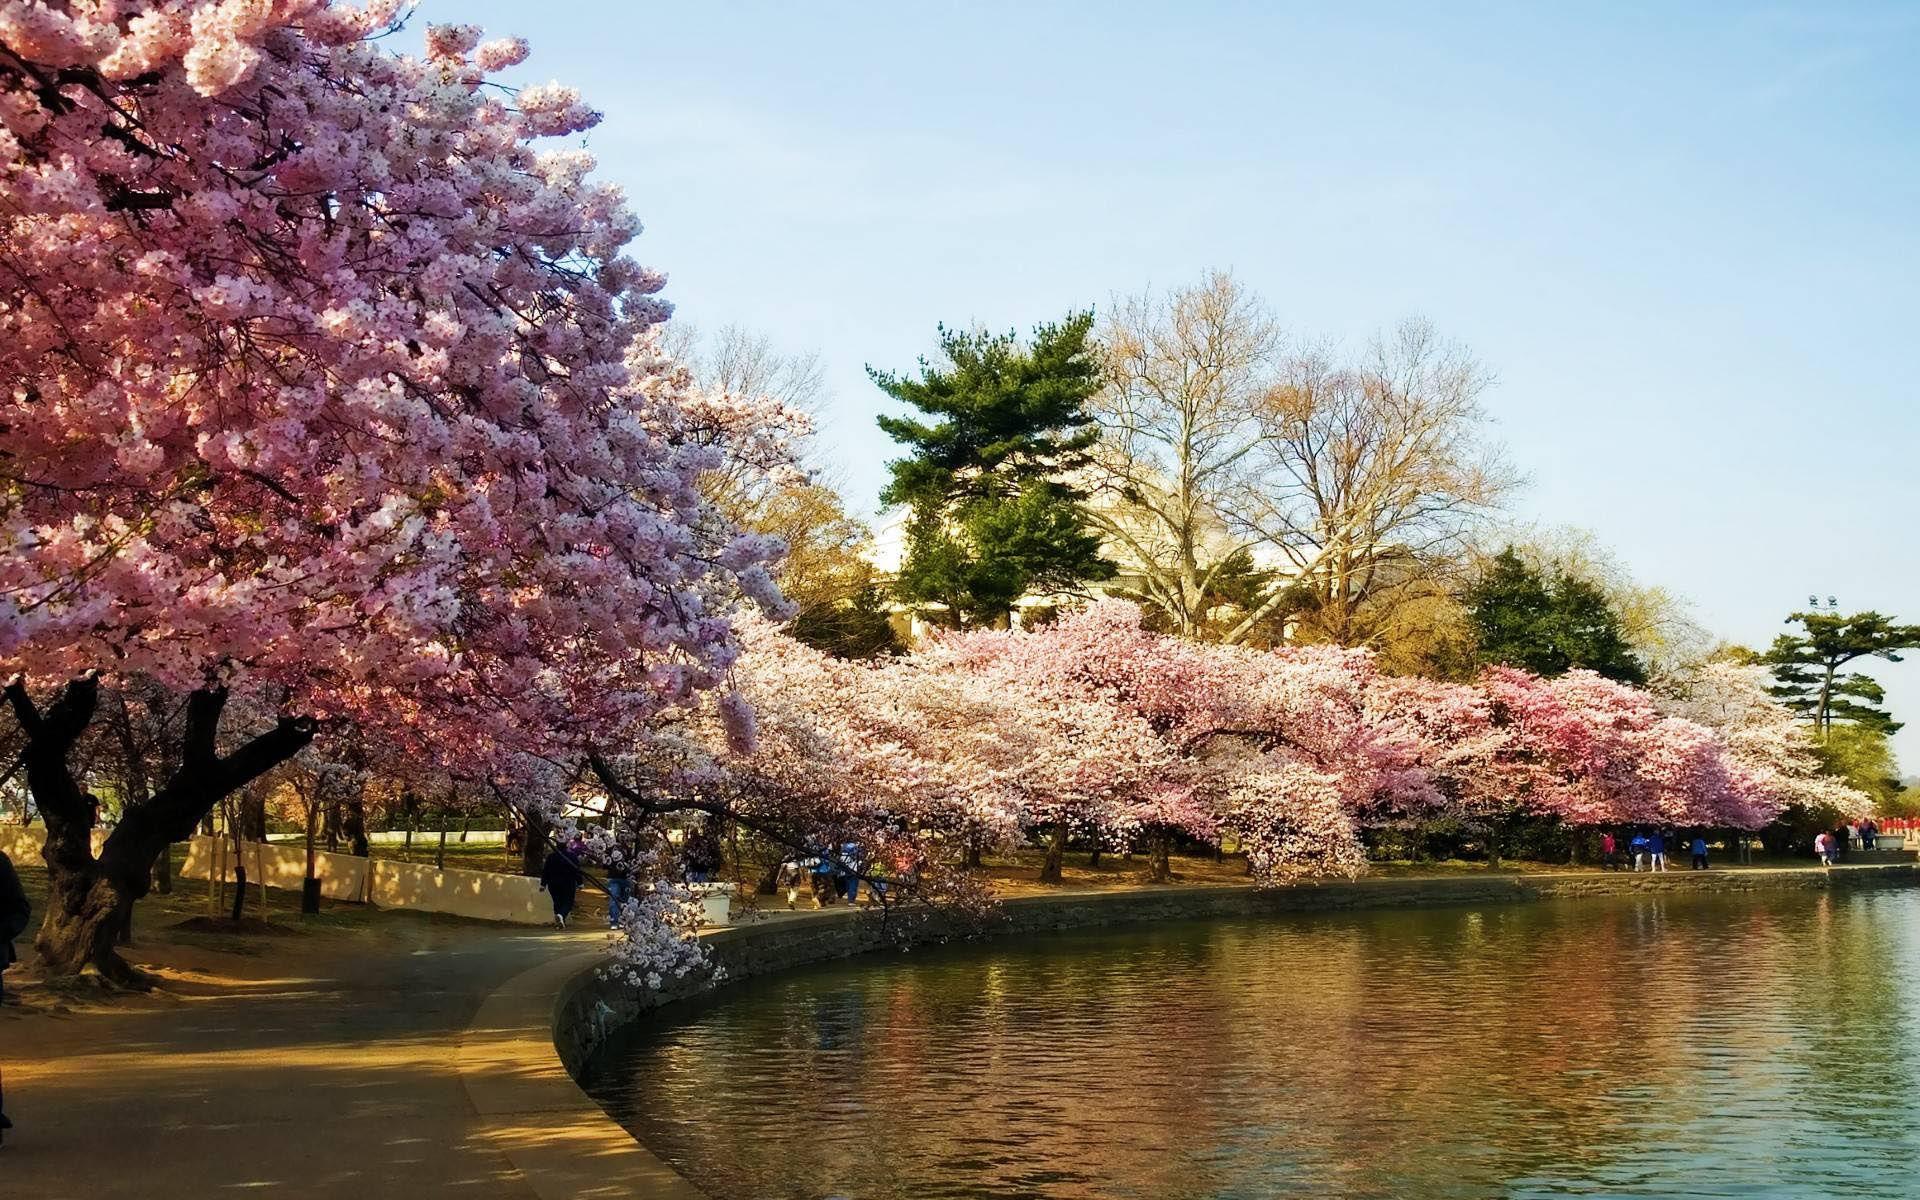 Dc Cherry Cherry Blossom Japan Cherry Blossom Wallpaper Blossom Trees